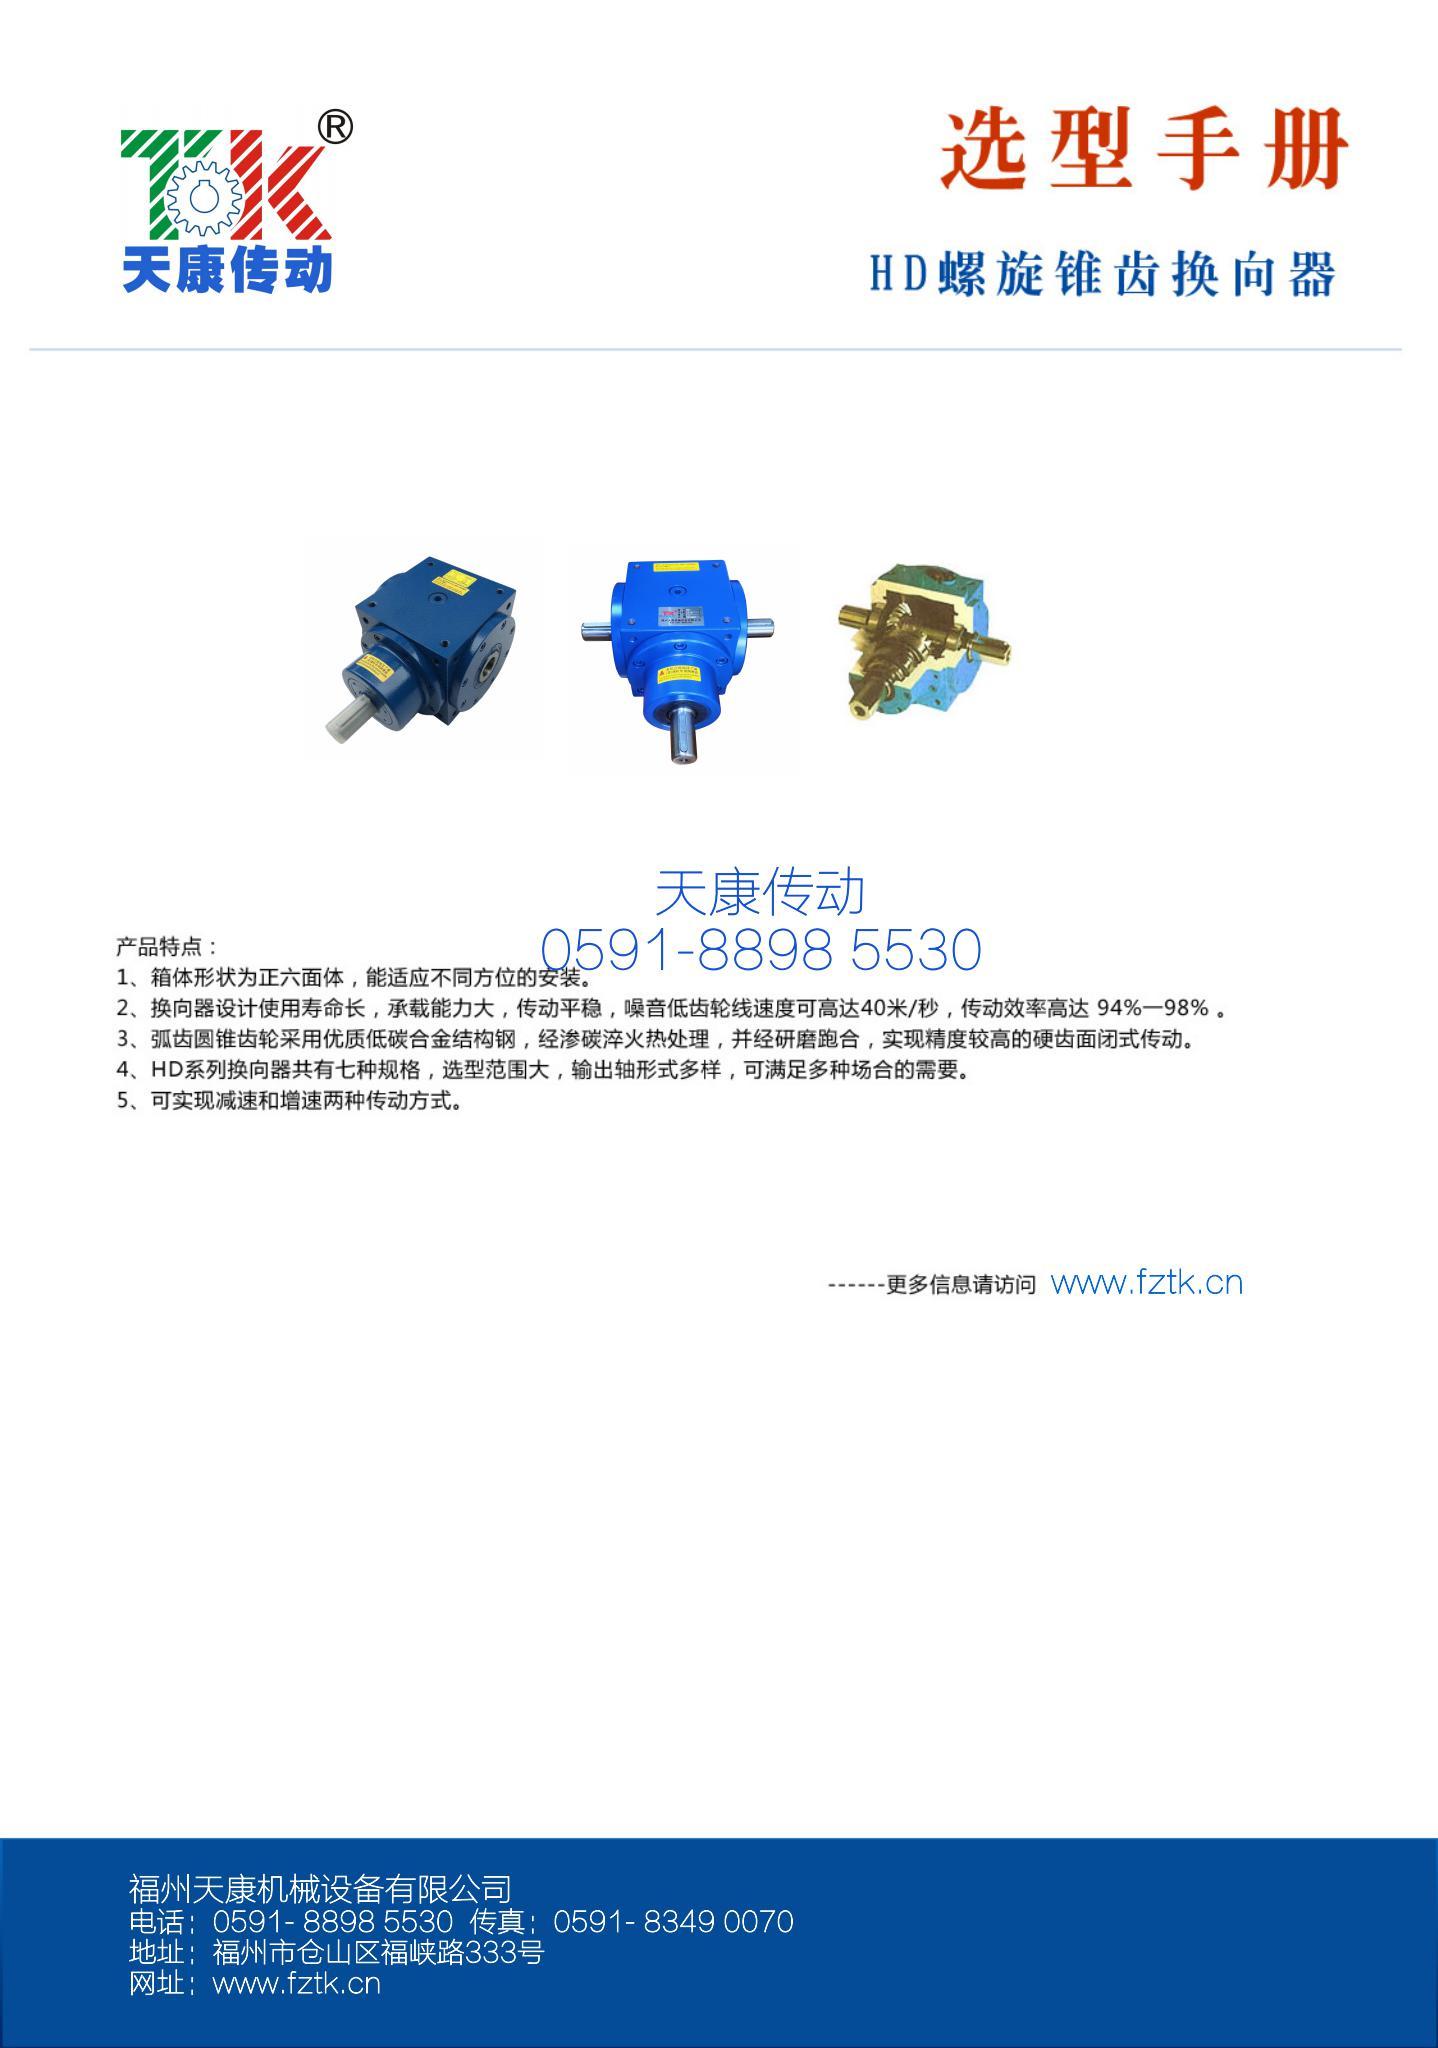 HD螺旋換向器1